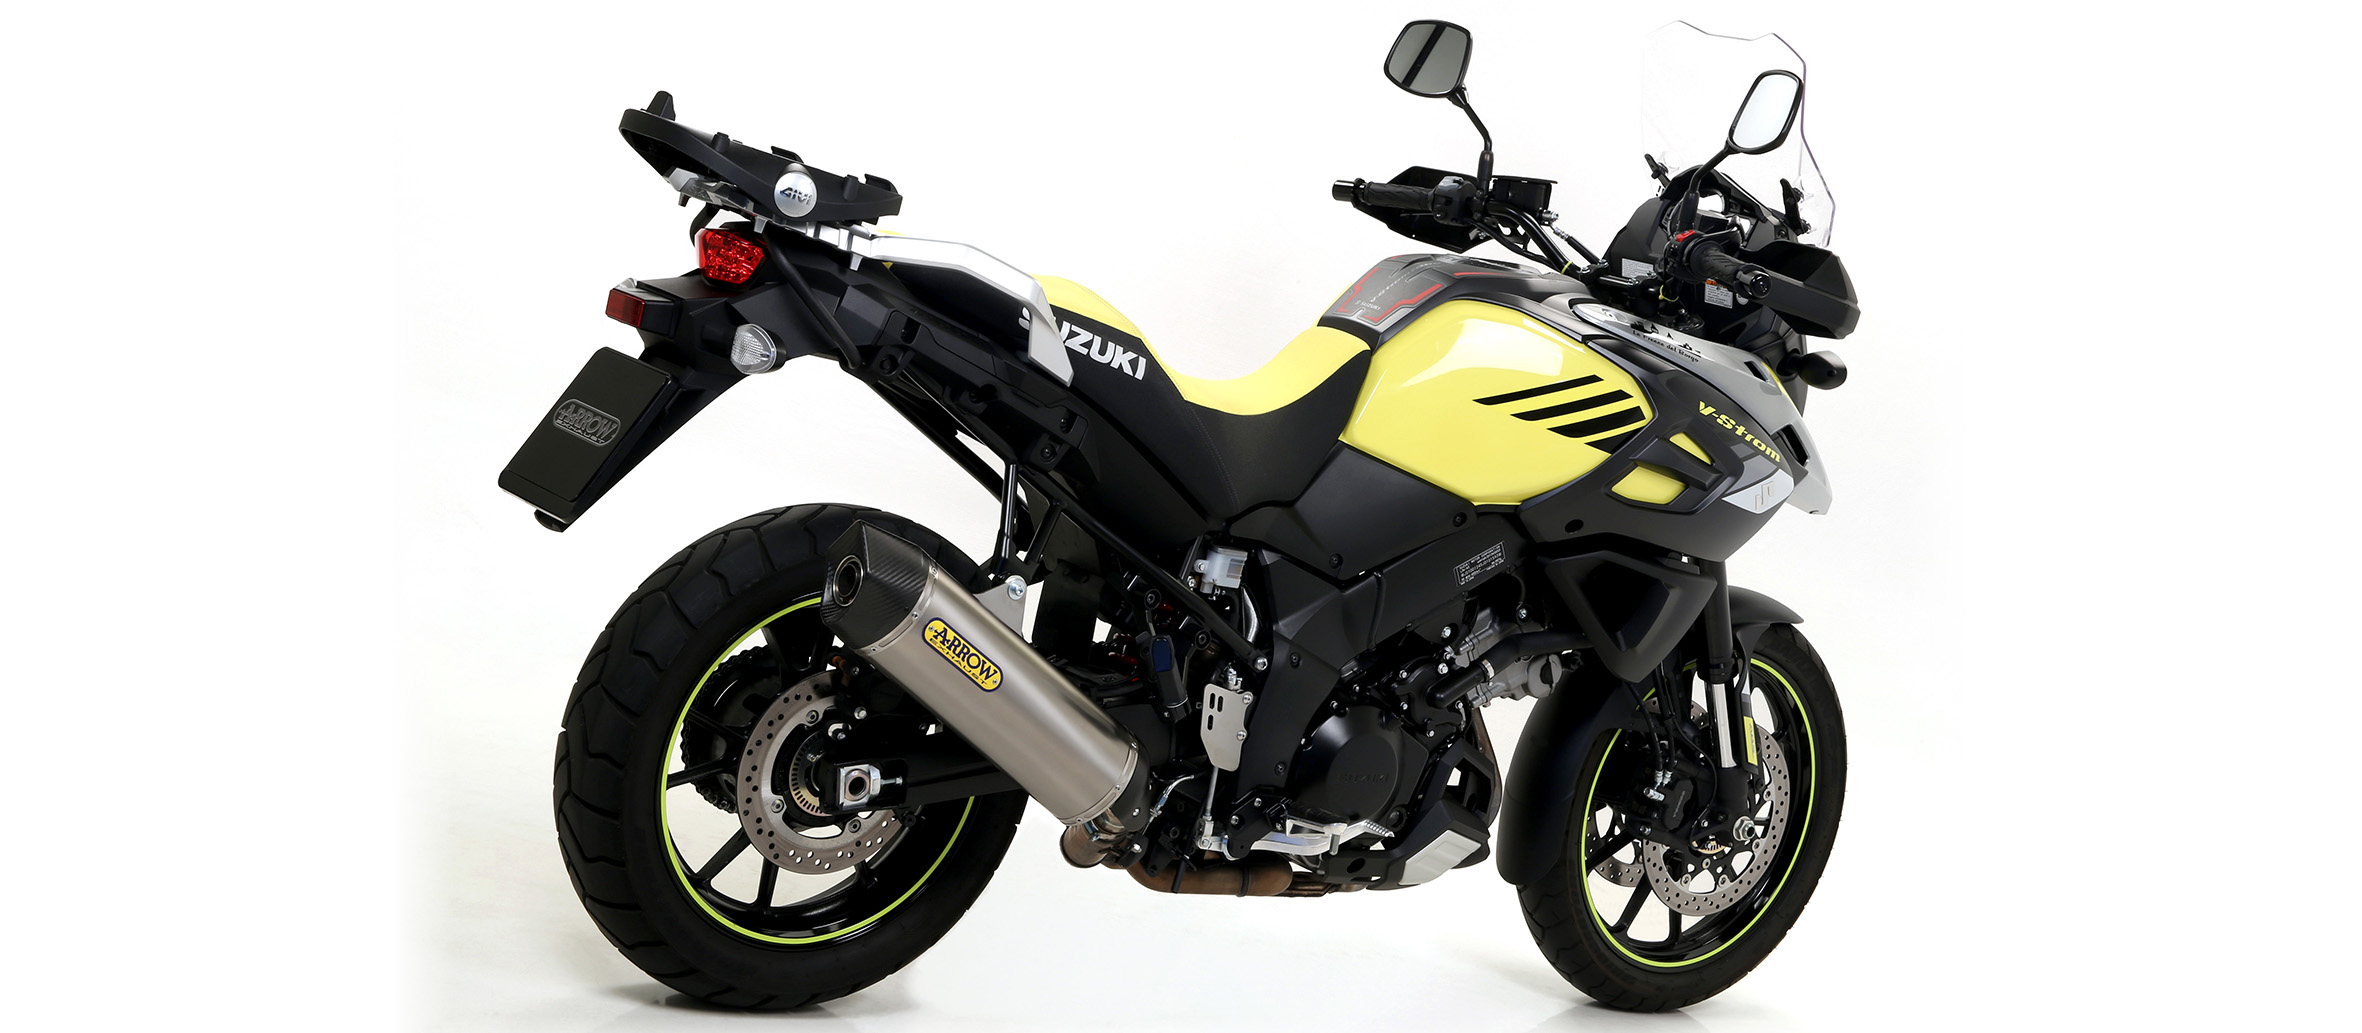 Escape Homologado Arrow Maxi Race-Tech Titanio para SUZUKI V-STROM 1000 2014>